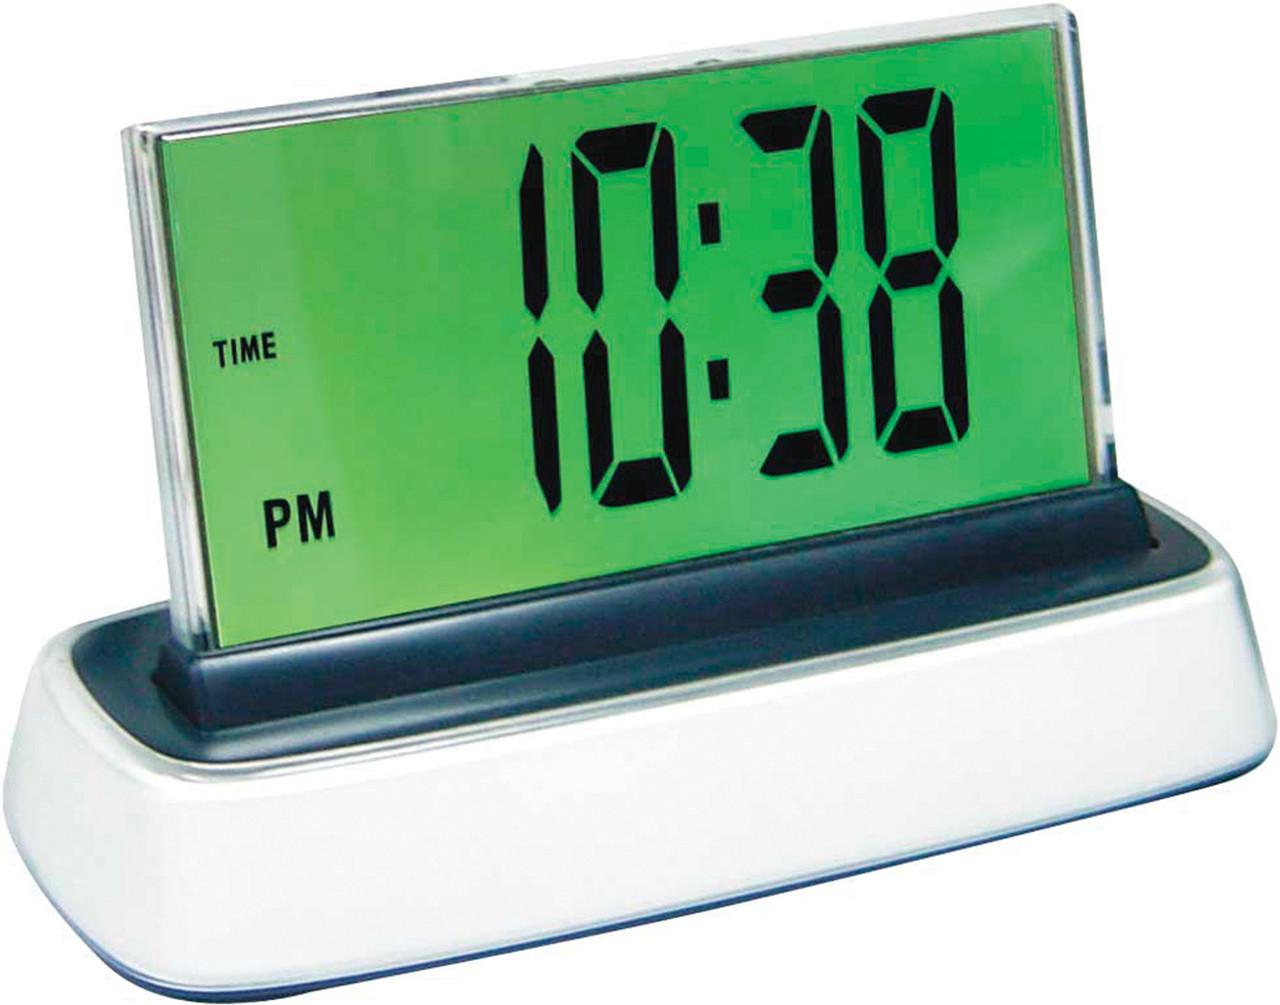 Moshi Voice Controlled Talking Alarm Clock